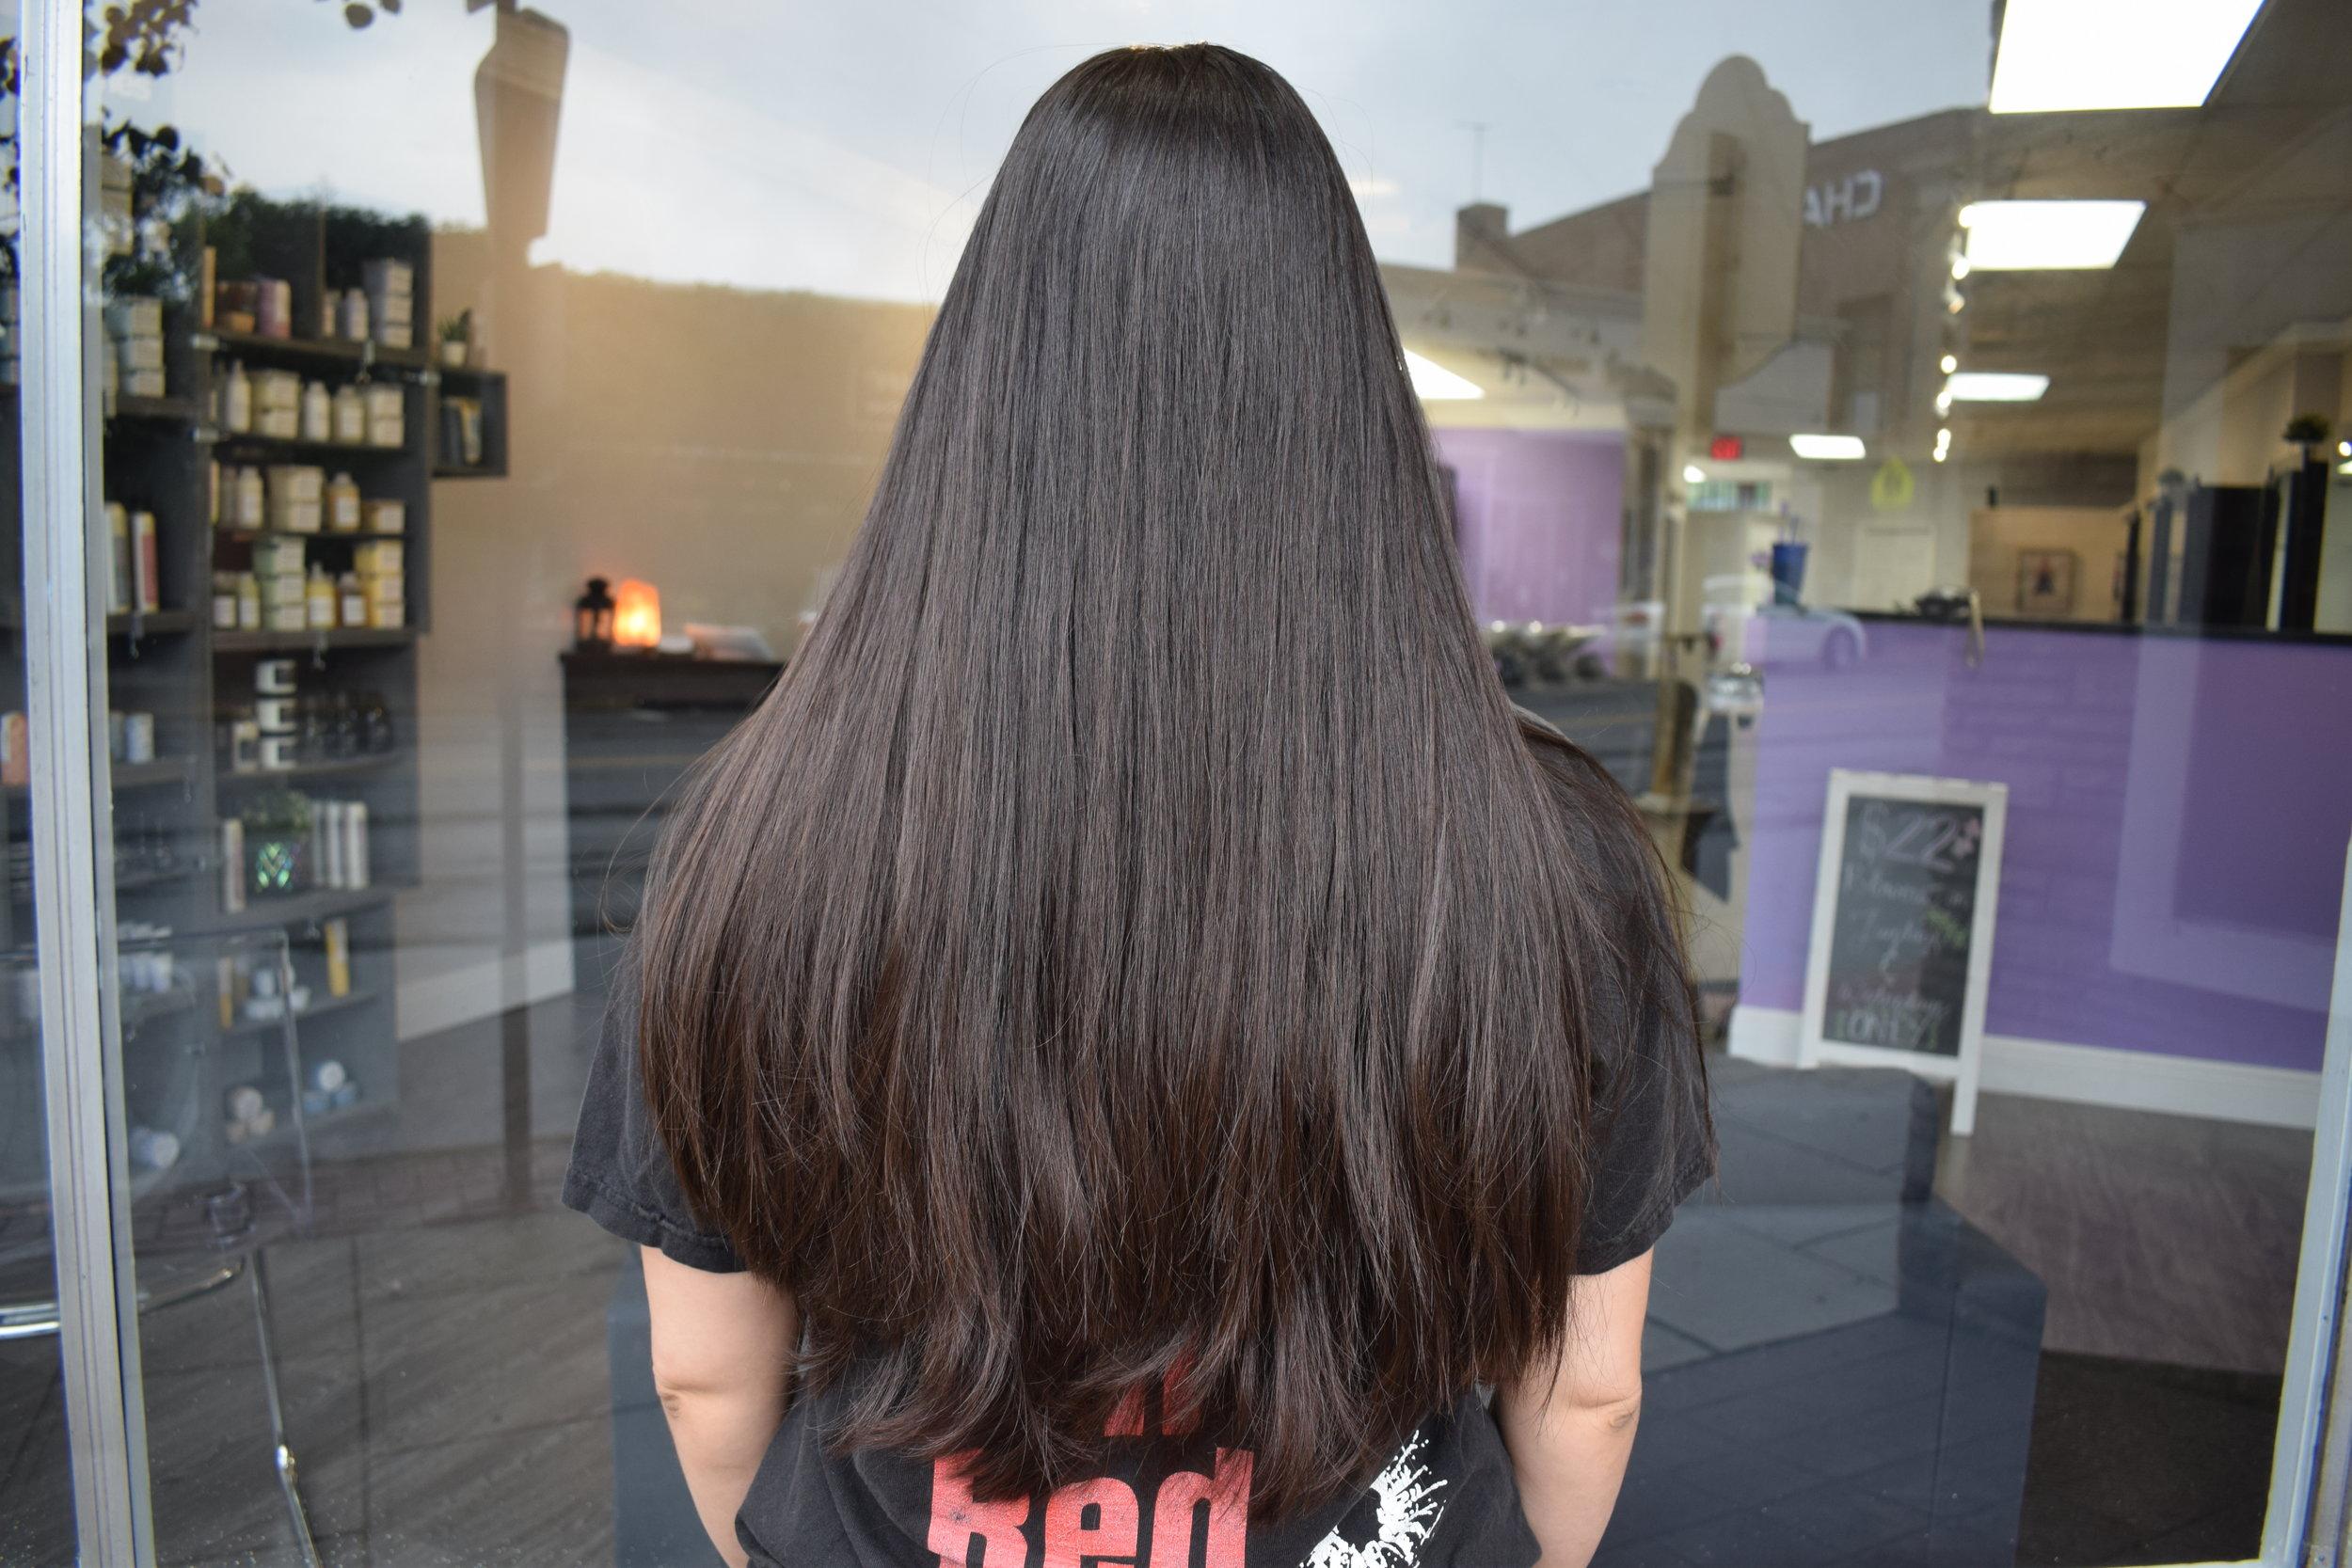 Amethyst Hair Studio A Cruelty Free Salon M Gandarinho